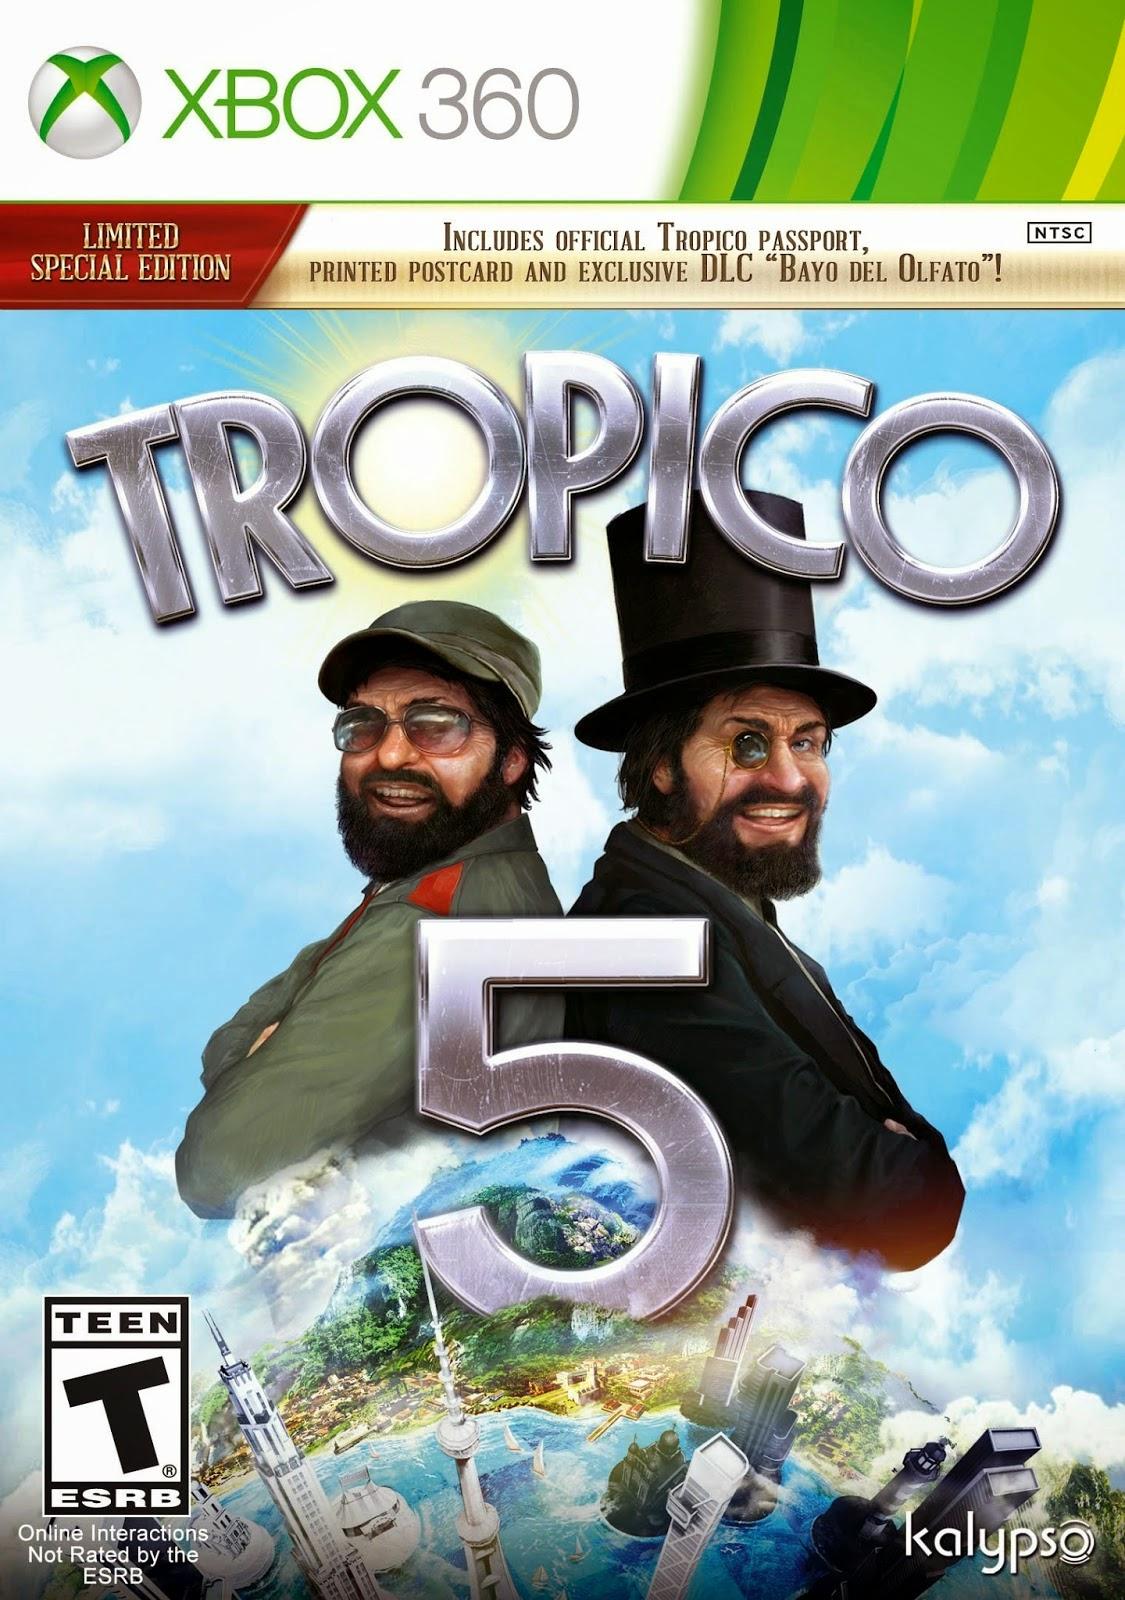 Tropico 5 XBOX360 free download full version